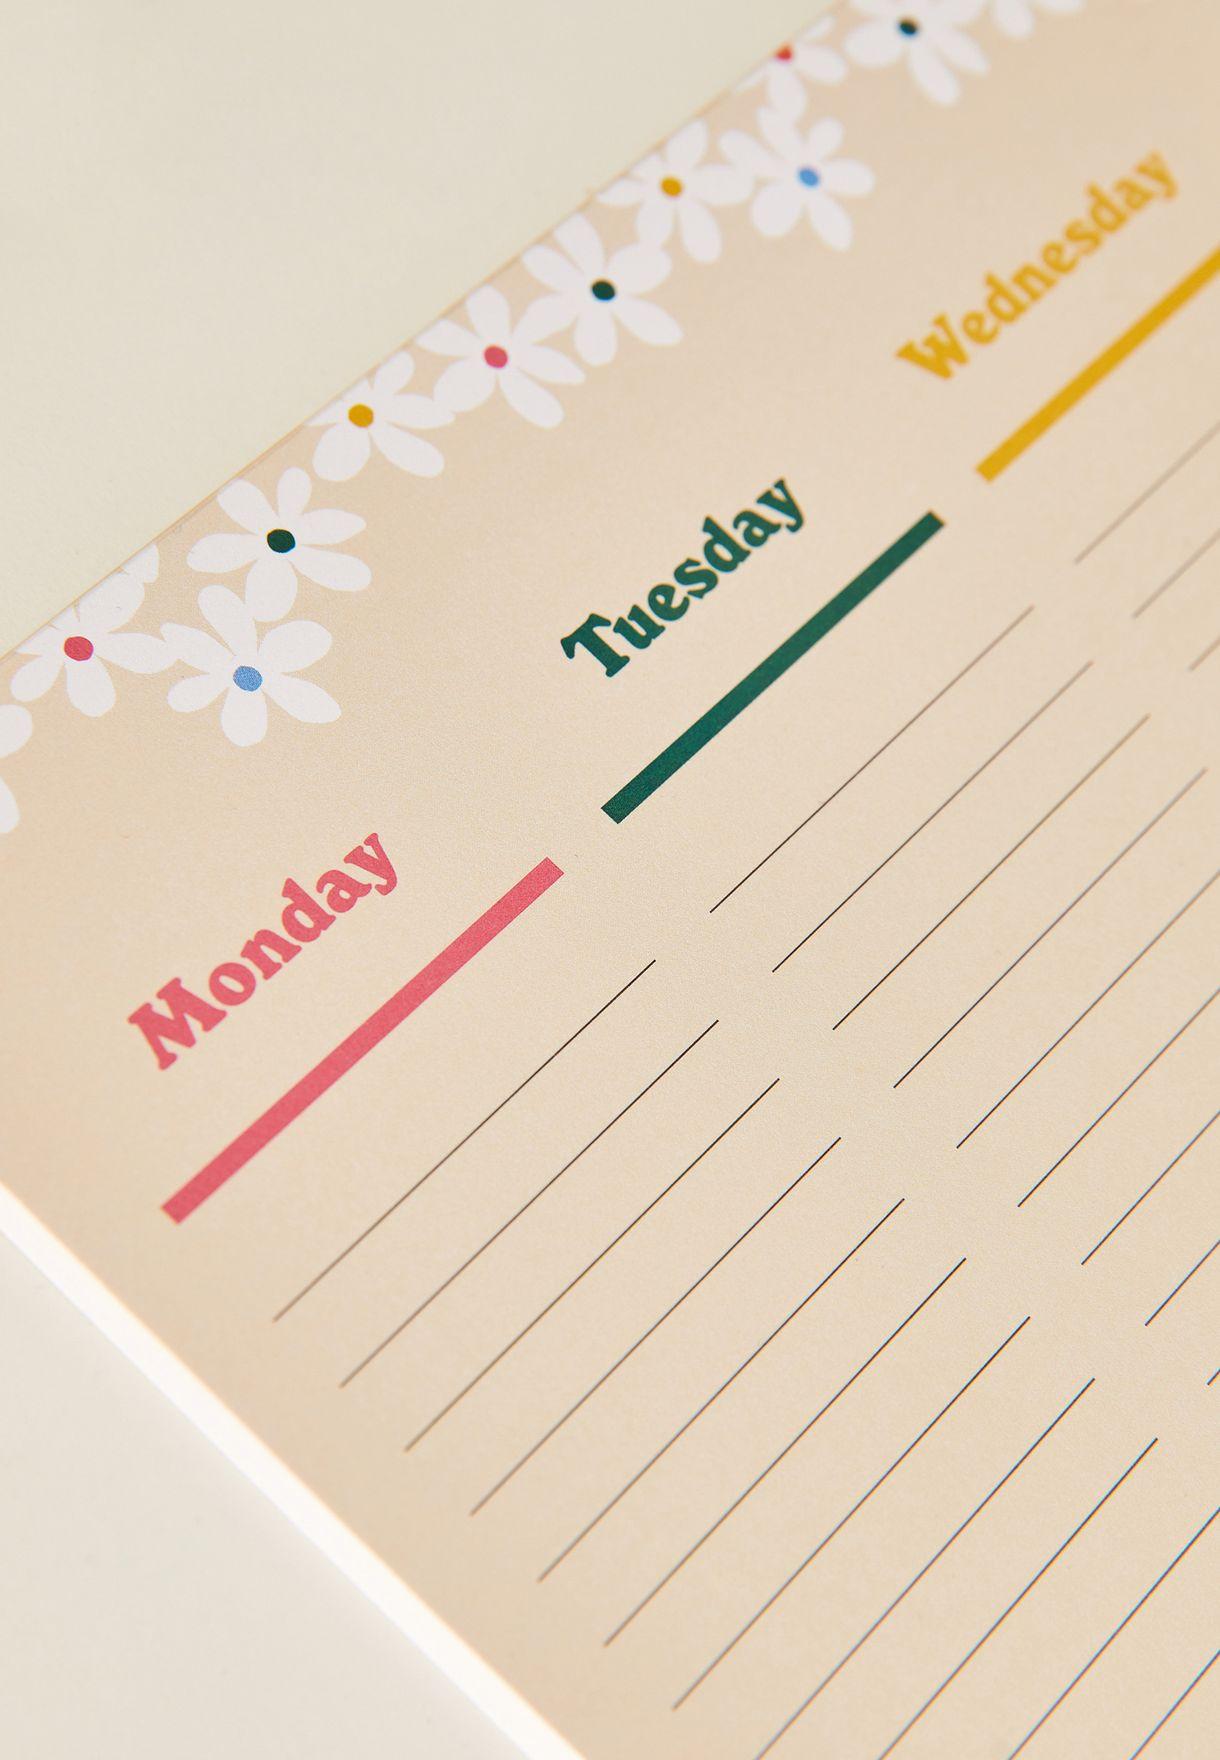 دفتر تخطيط اسبوعي بدون تاريخ